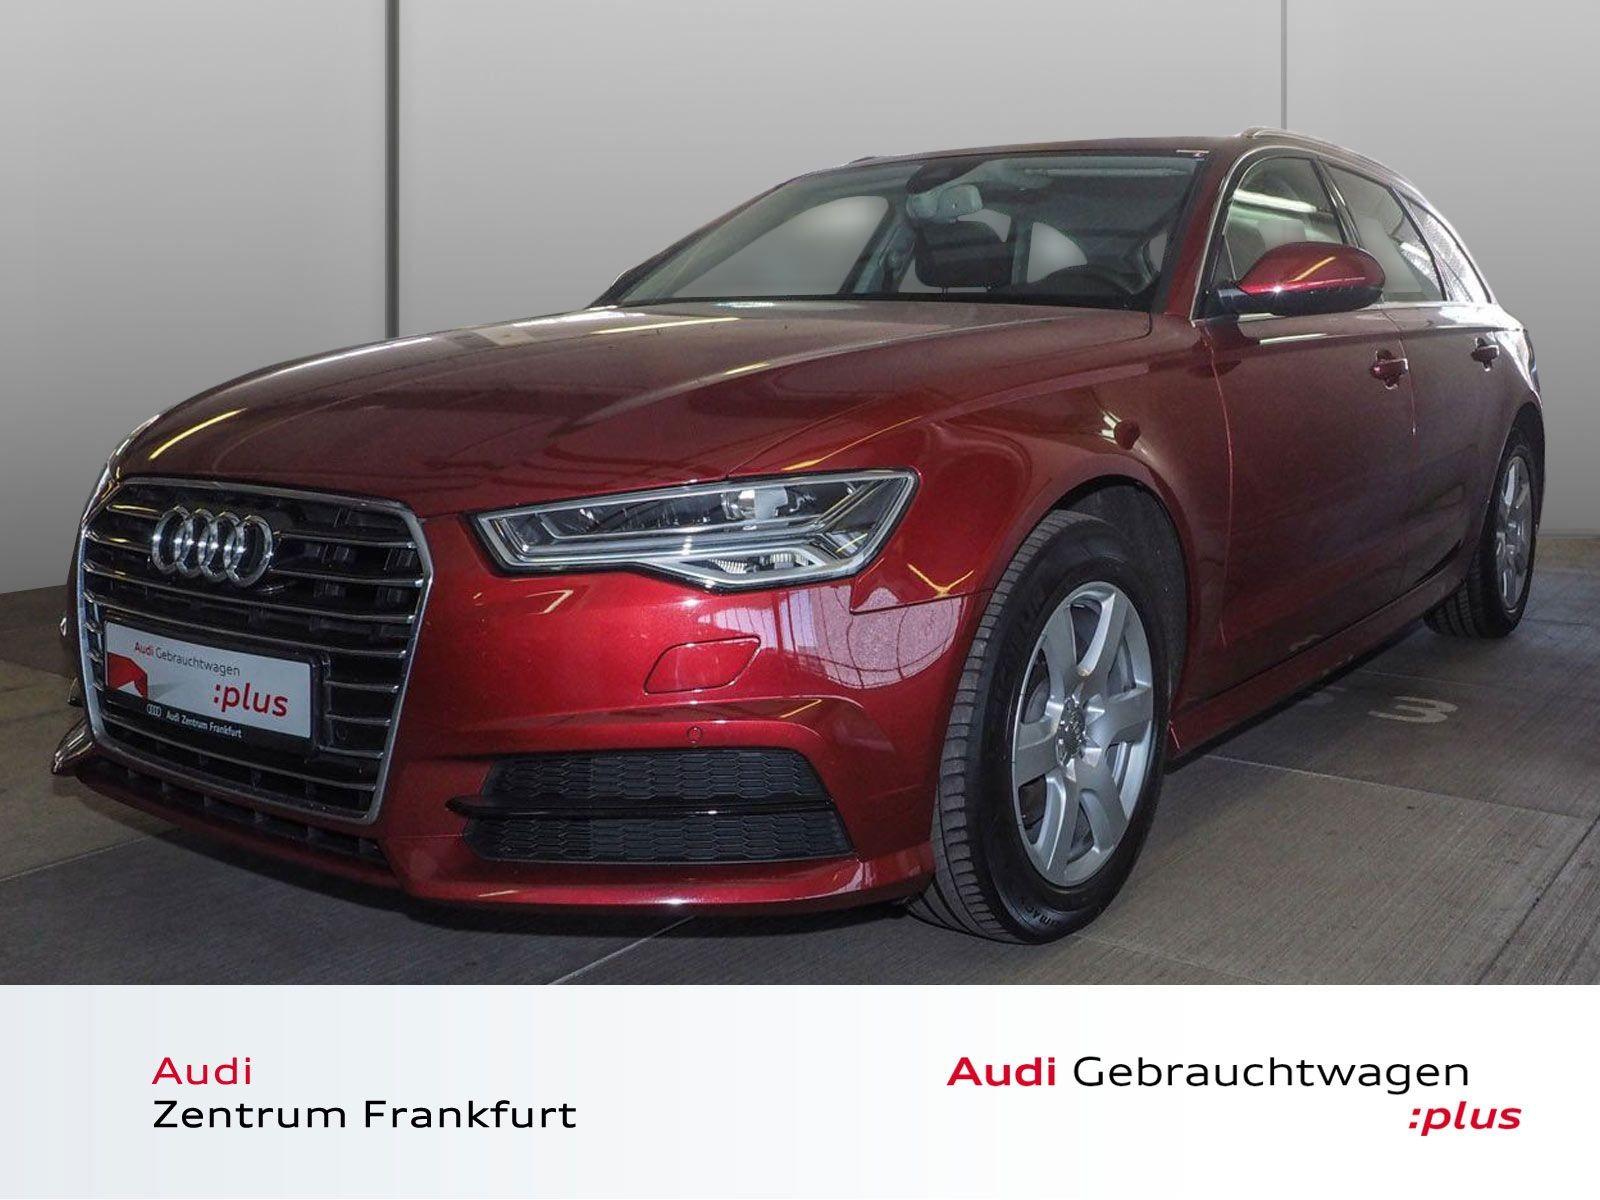 Audi A6 Avant 2.0 TDI ultra Matrix-LED Navi Tempomat PDC Sitzheizung, Jahr 2018, Diesel